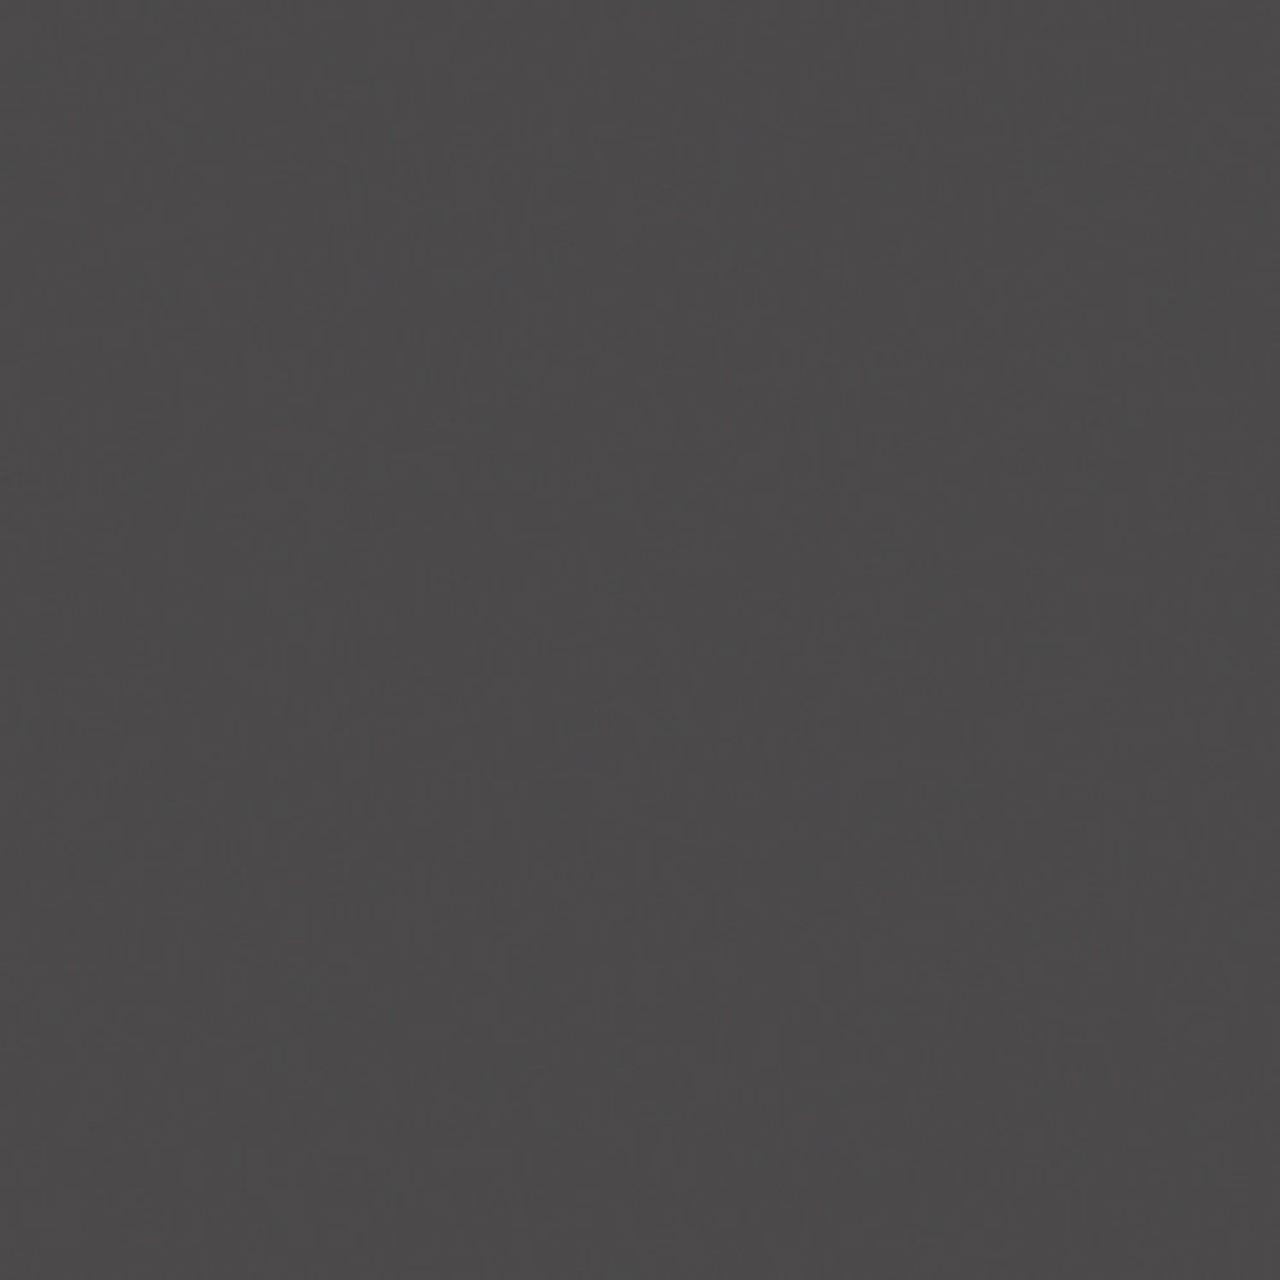 "Rosco Cinegel Polarizing Gel 17"", Filter, Gels"